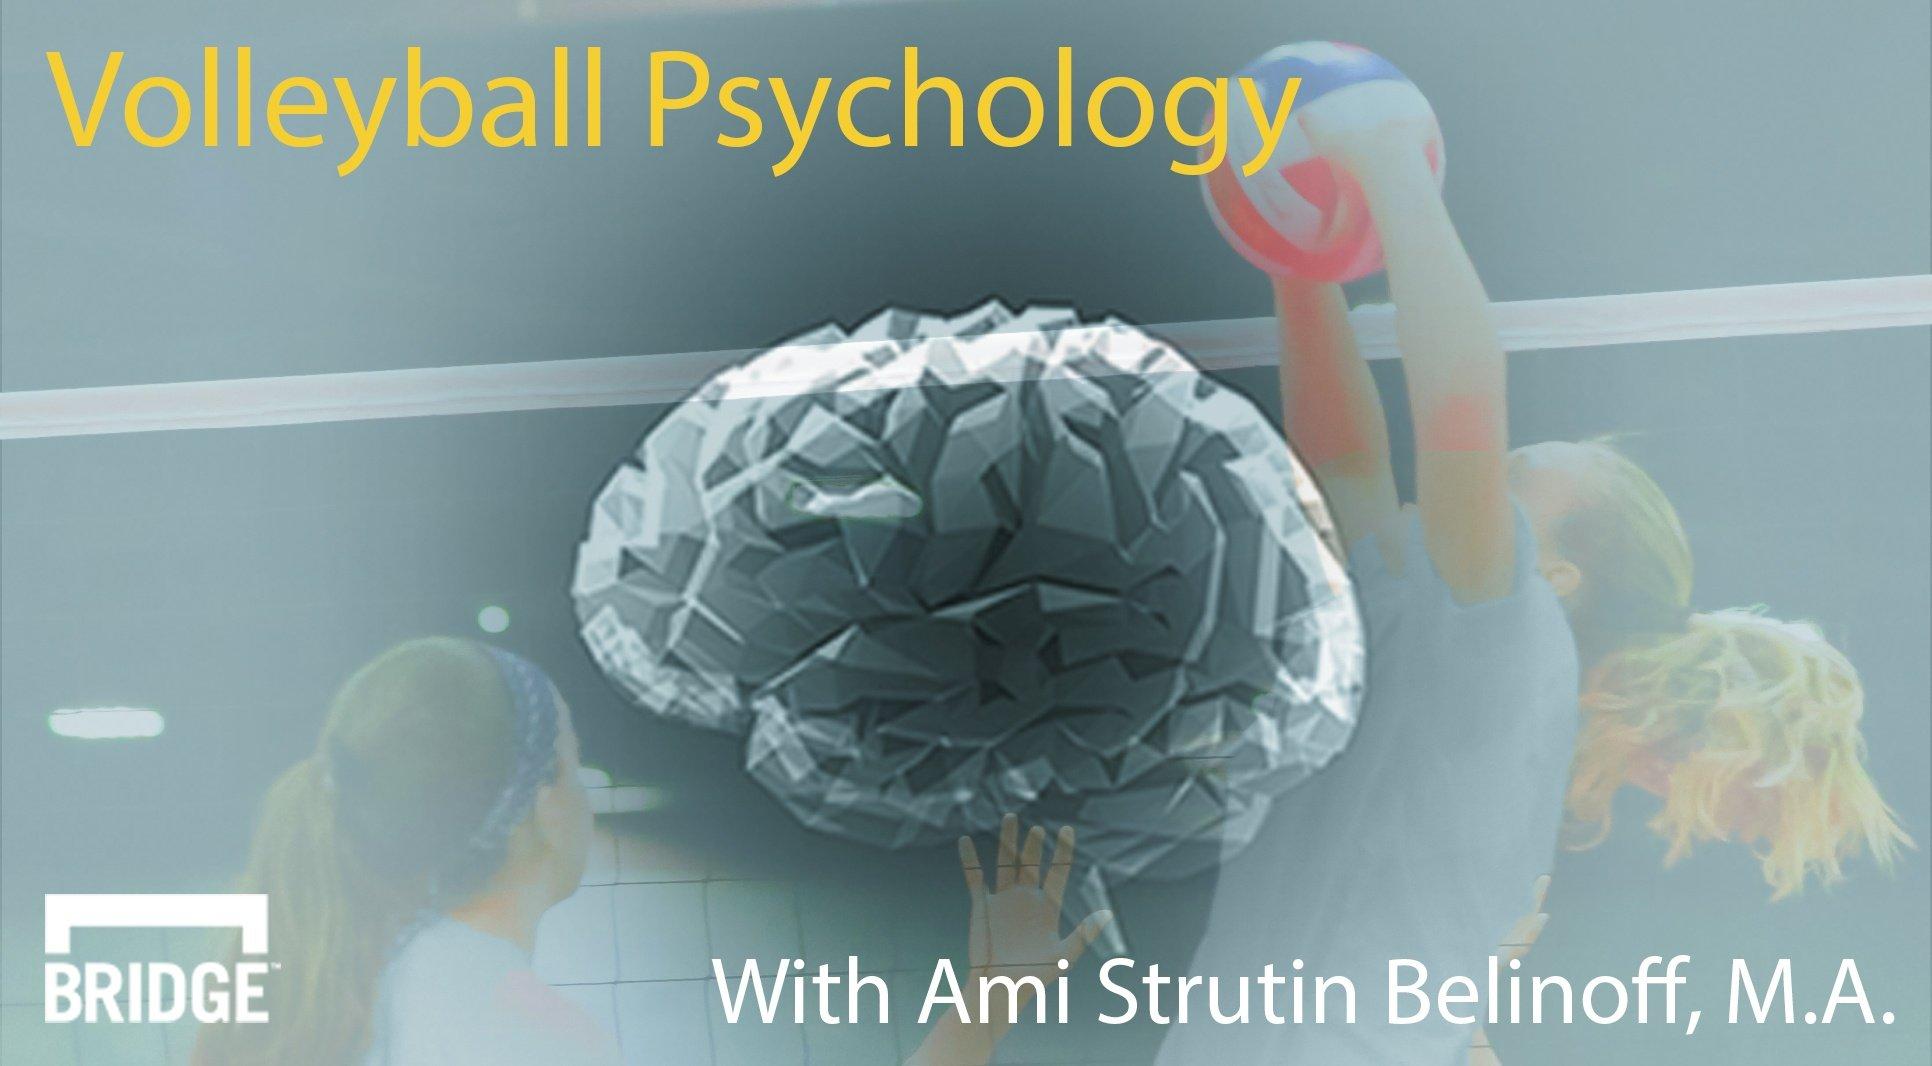 Volleyball Psychology